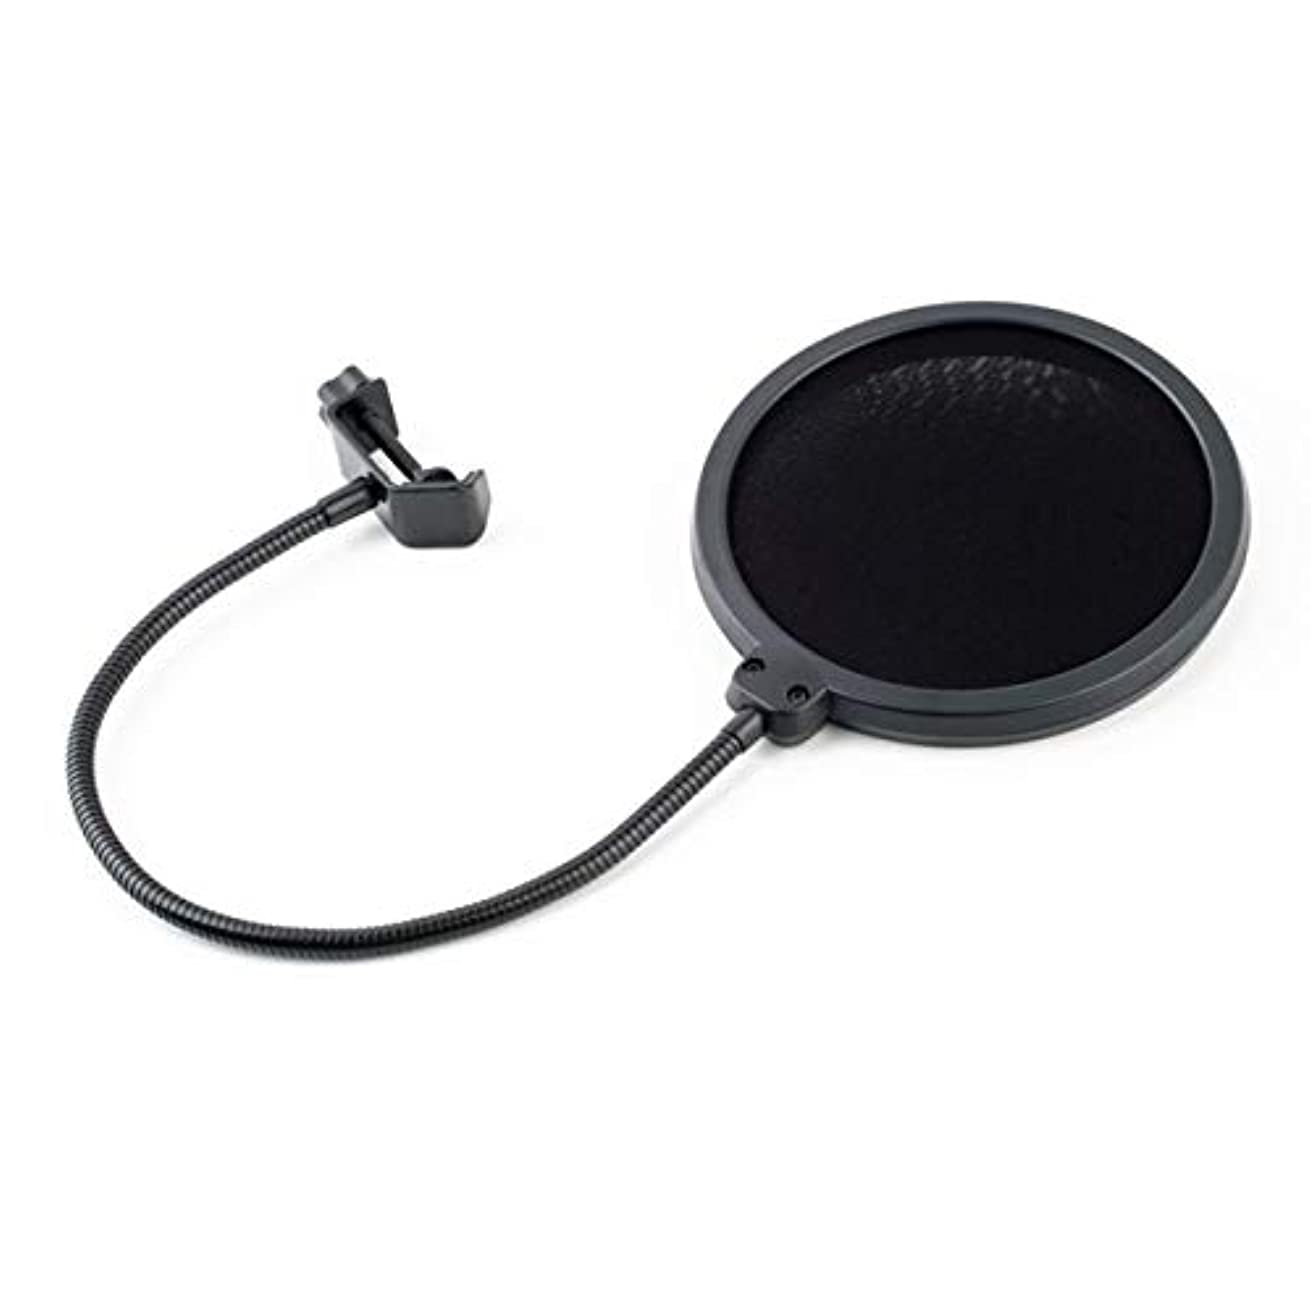 XuBa Professional Flexible Double Layer Studio Recording Mic Microphone Wind Screen Clamp On Pop Filter Mask Shied Gooseneck Black Show